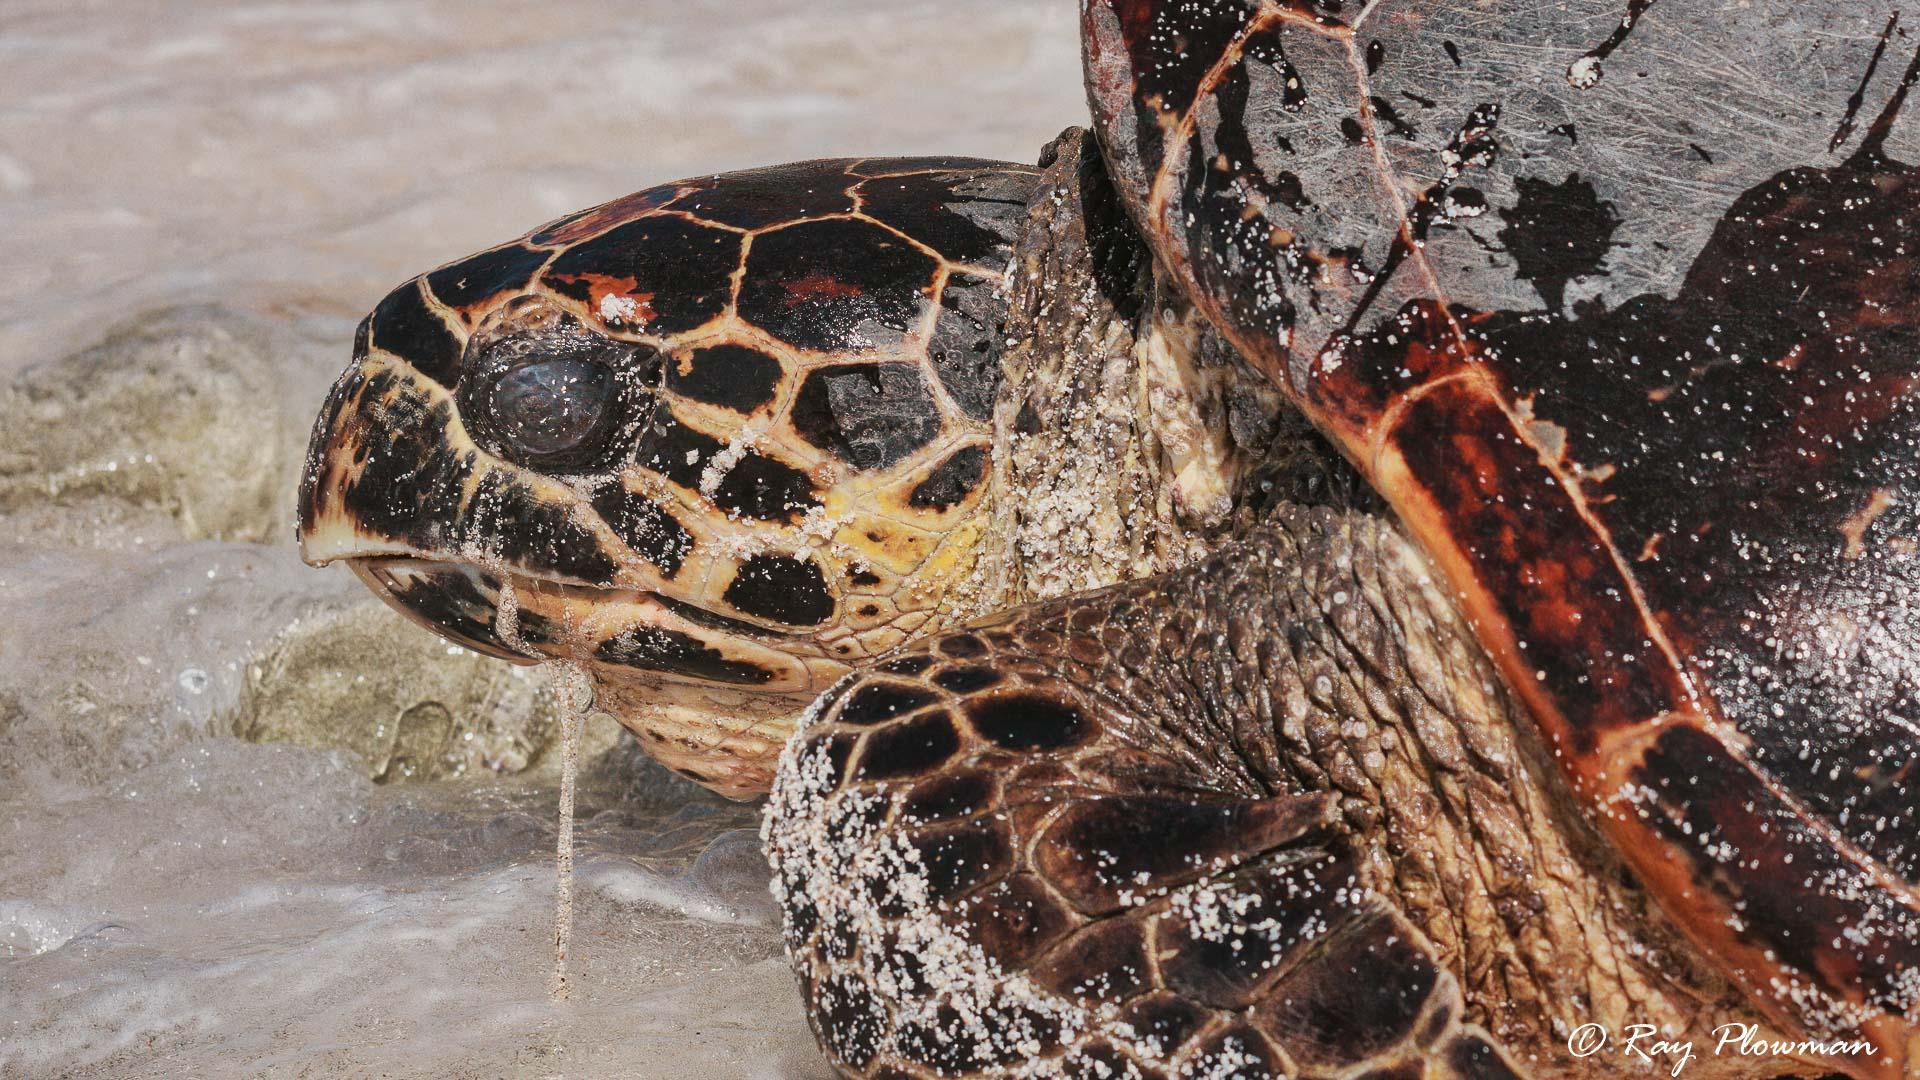 Close-up of Hawksbill Turtle (Eretmochelys imbricata) on Mahe Islands Anse Bazarca beach